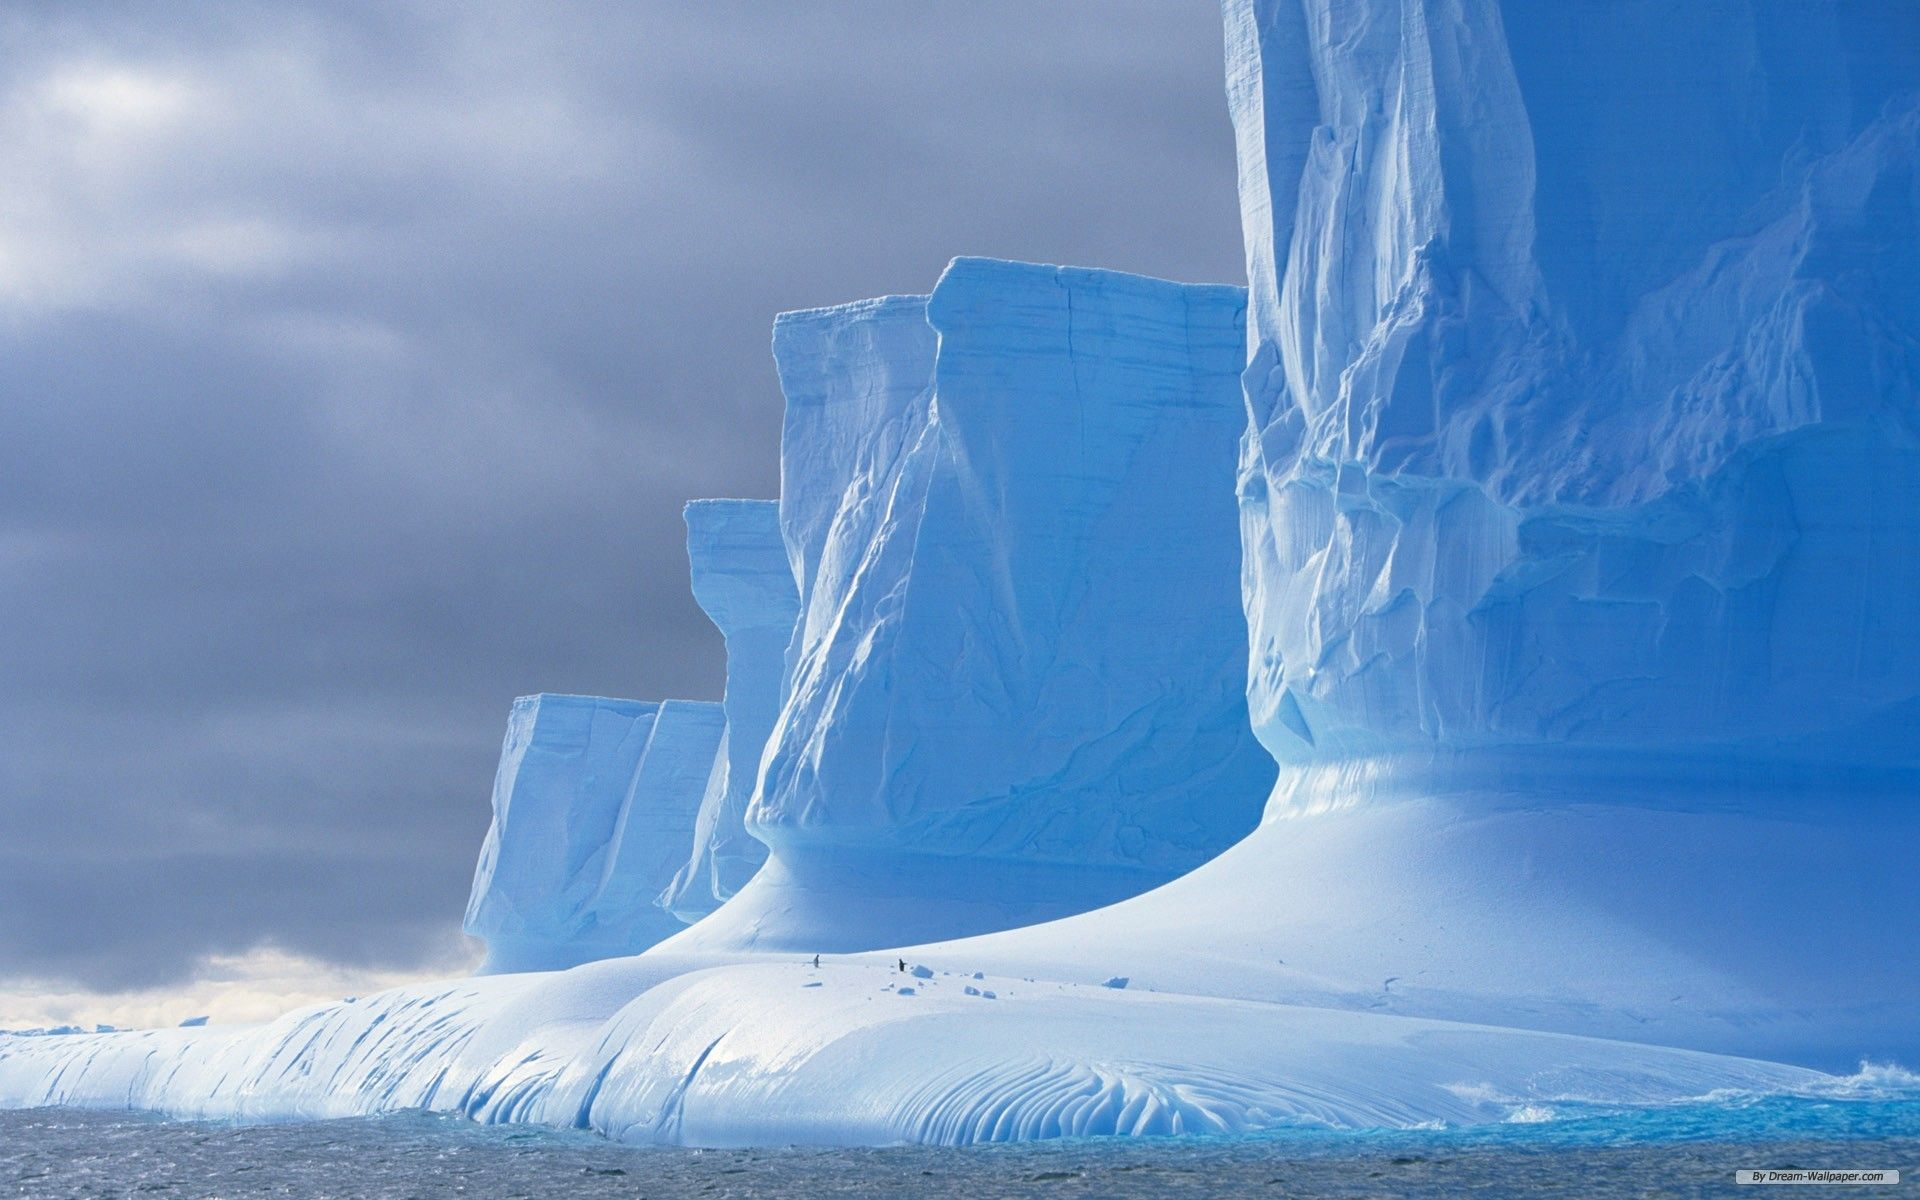 Antarctica Wallpapers 1920x1200 79YE5YN WallpapersExpertcom 1920x1200